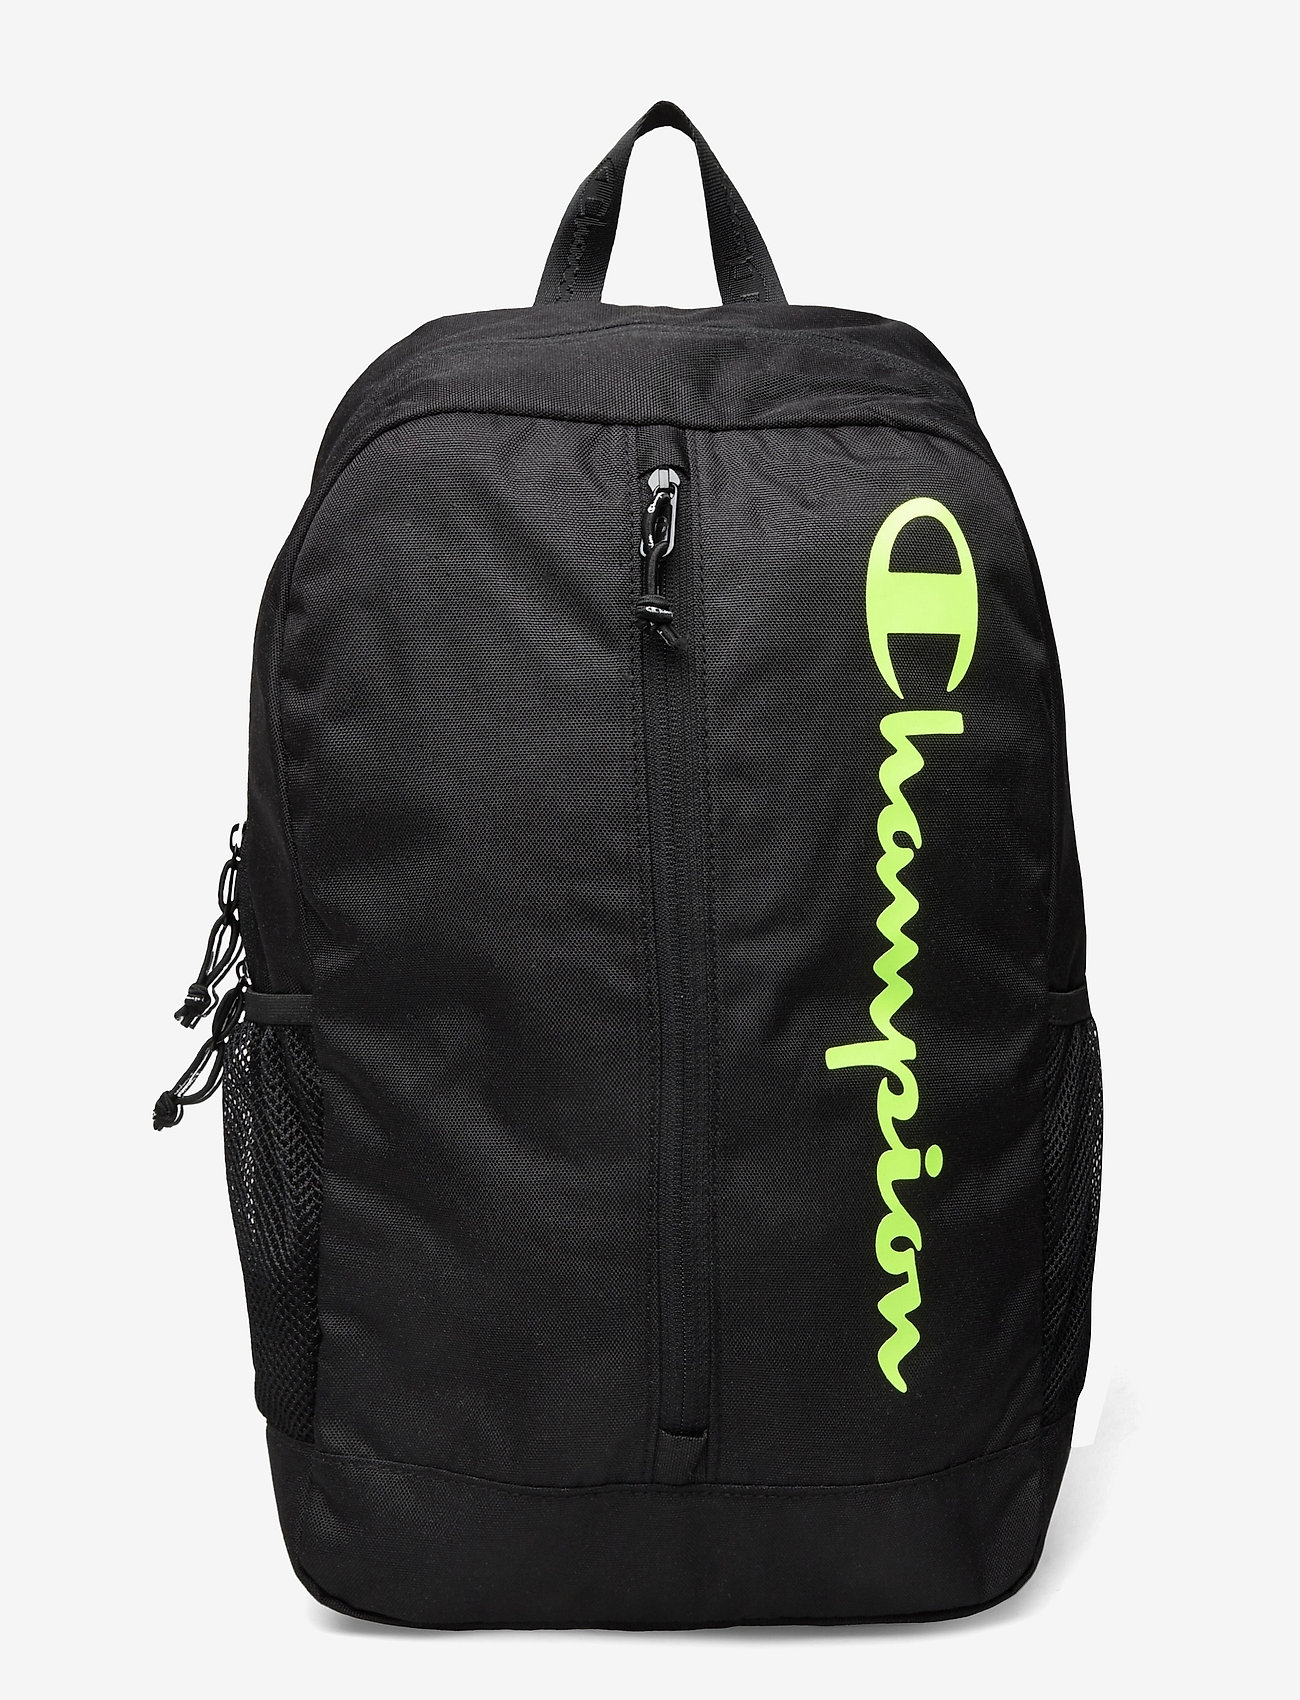 Champion - Backpack - treenikassit - black beauty - 0